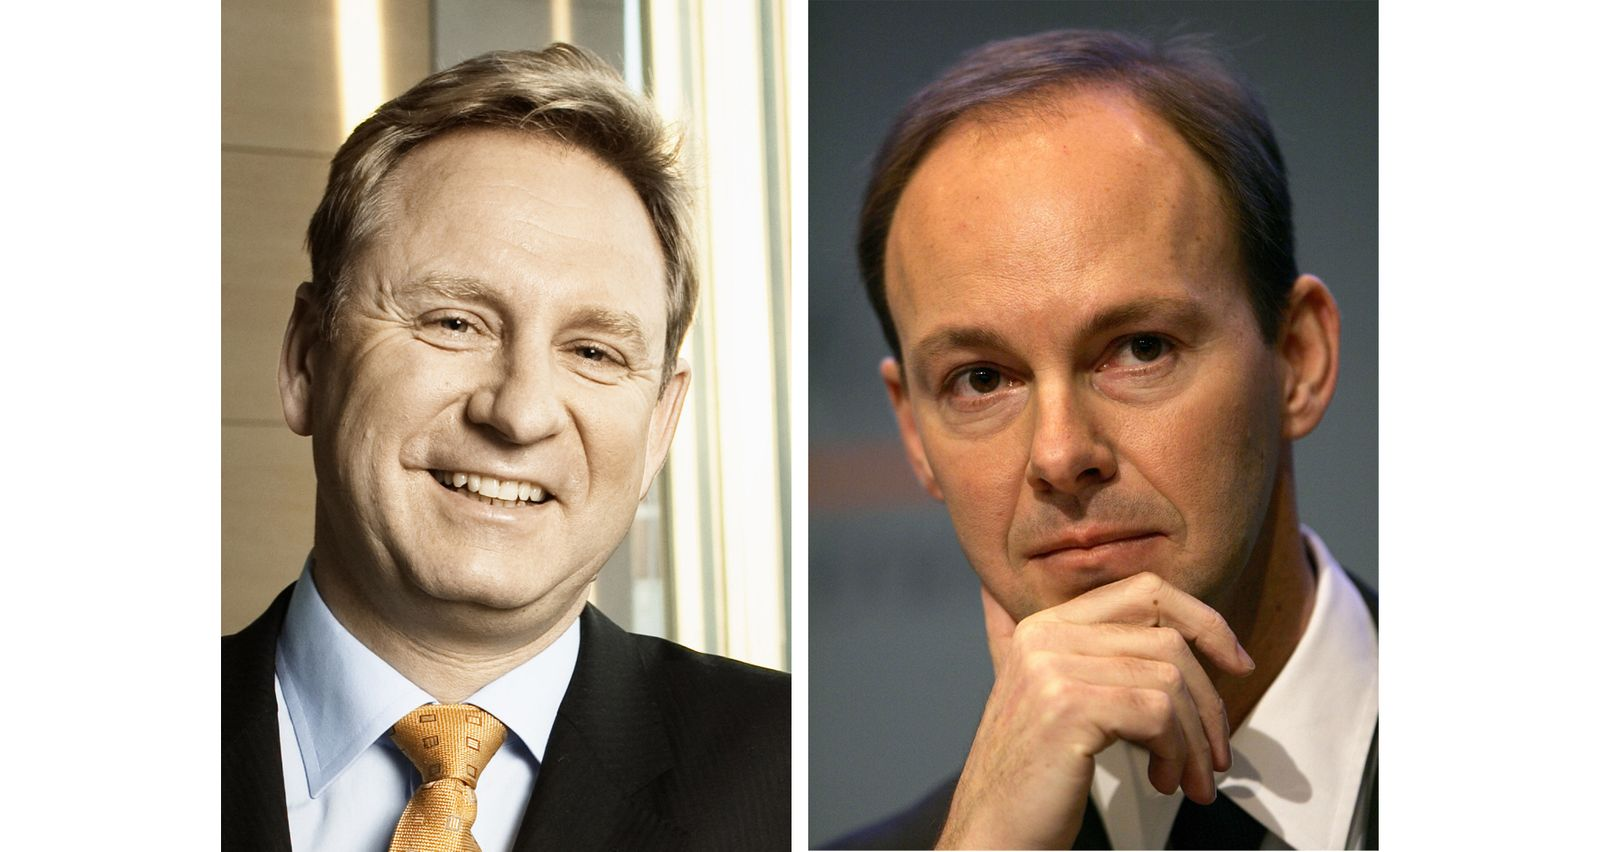 KOMBO Hartmut Ostrowski / Thomas Rabe / Bertelsmann